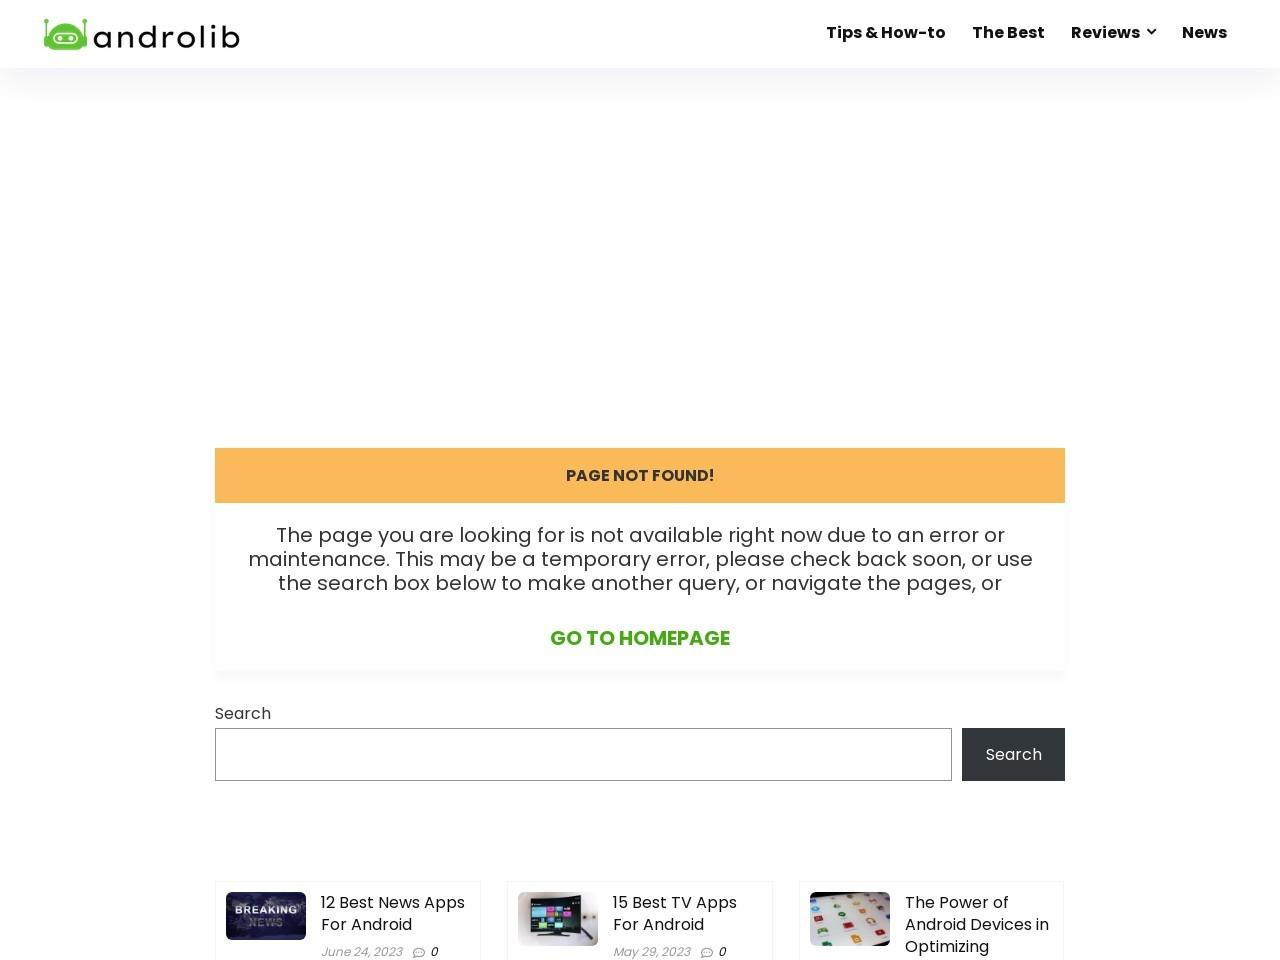 Endomondo Sports Tracker ~ Android Application v8.3.0 By Endomondo.com | Health & Fitness